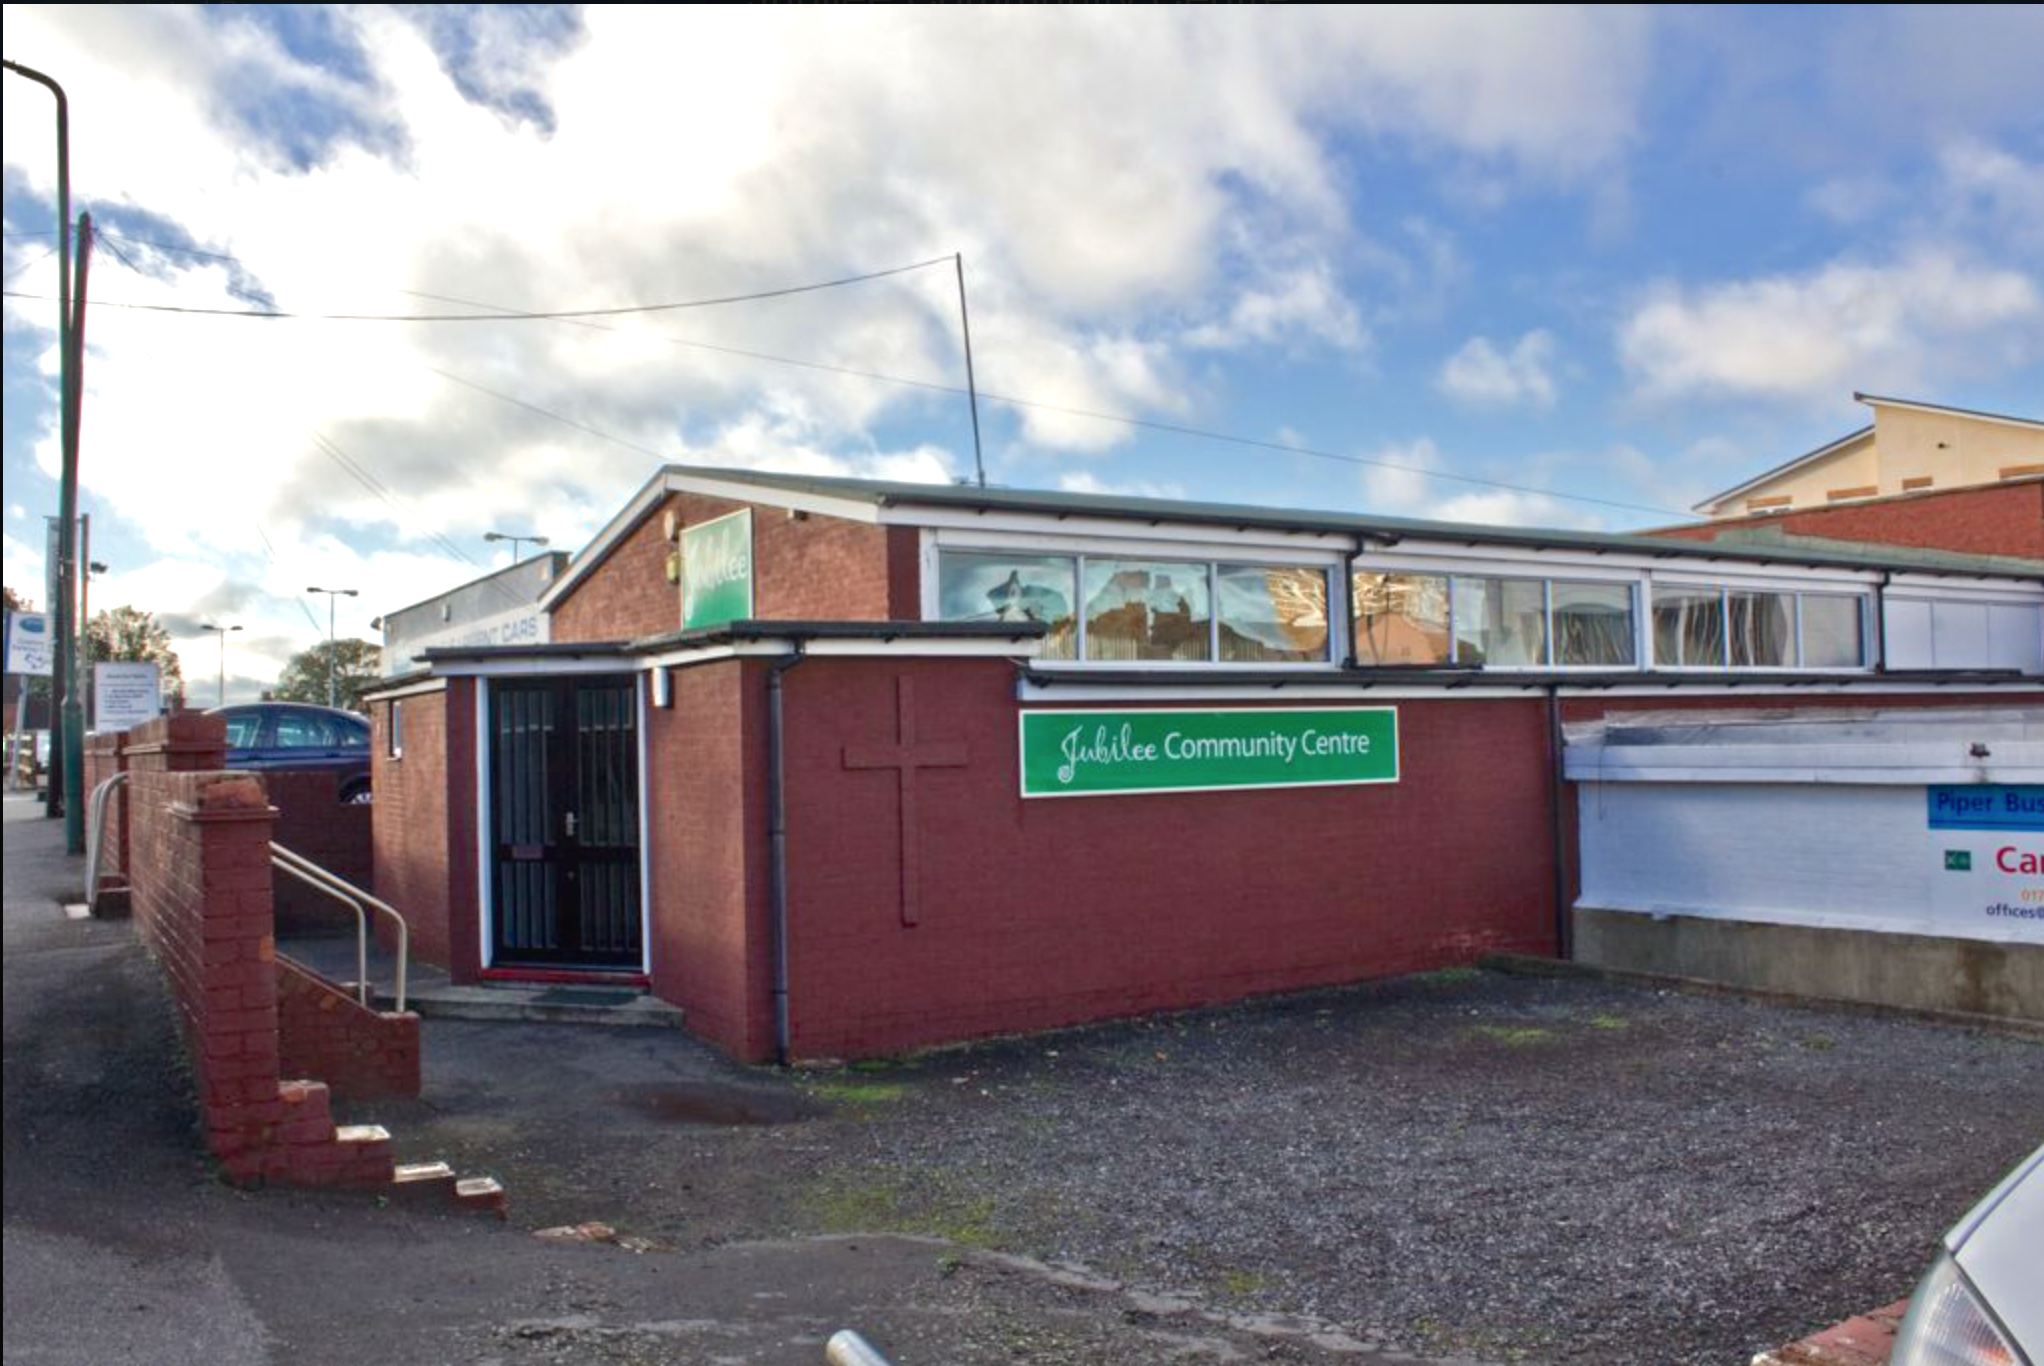 Jubilee Community Centre